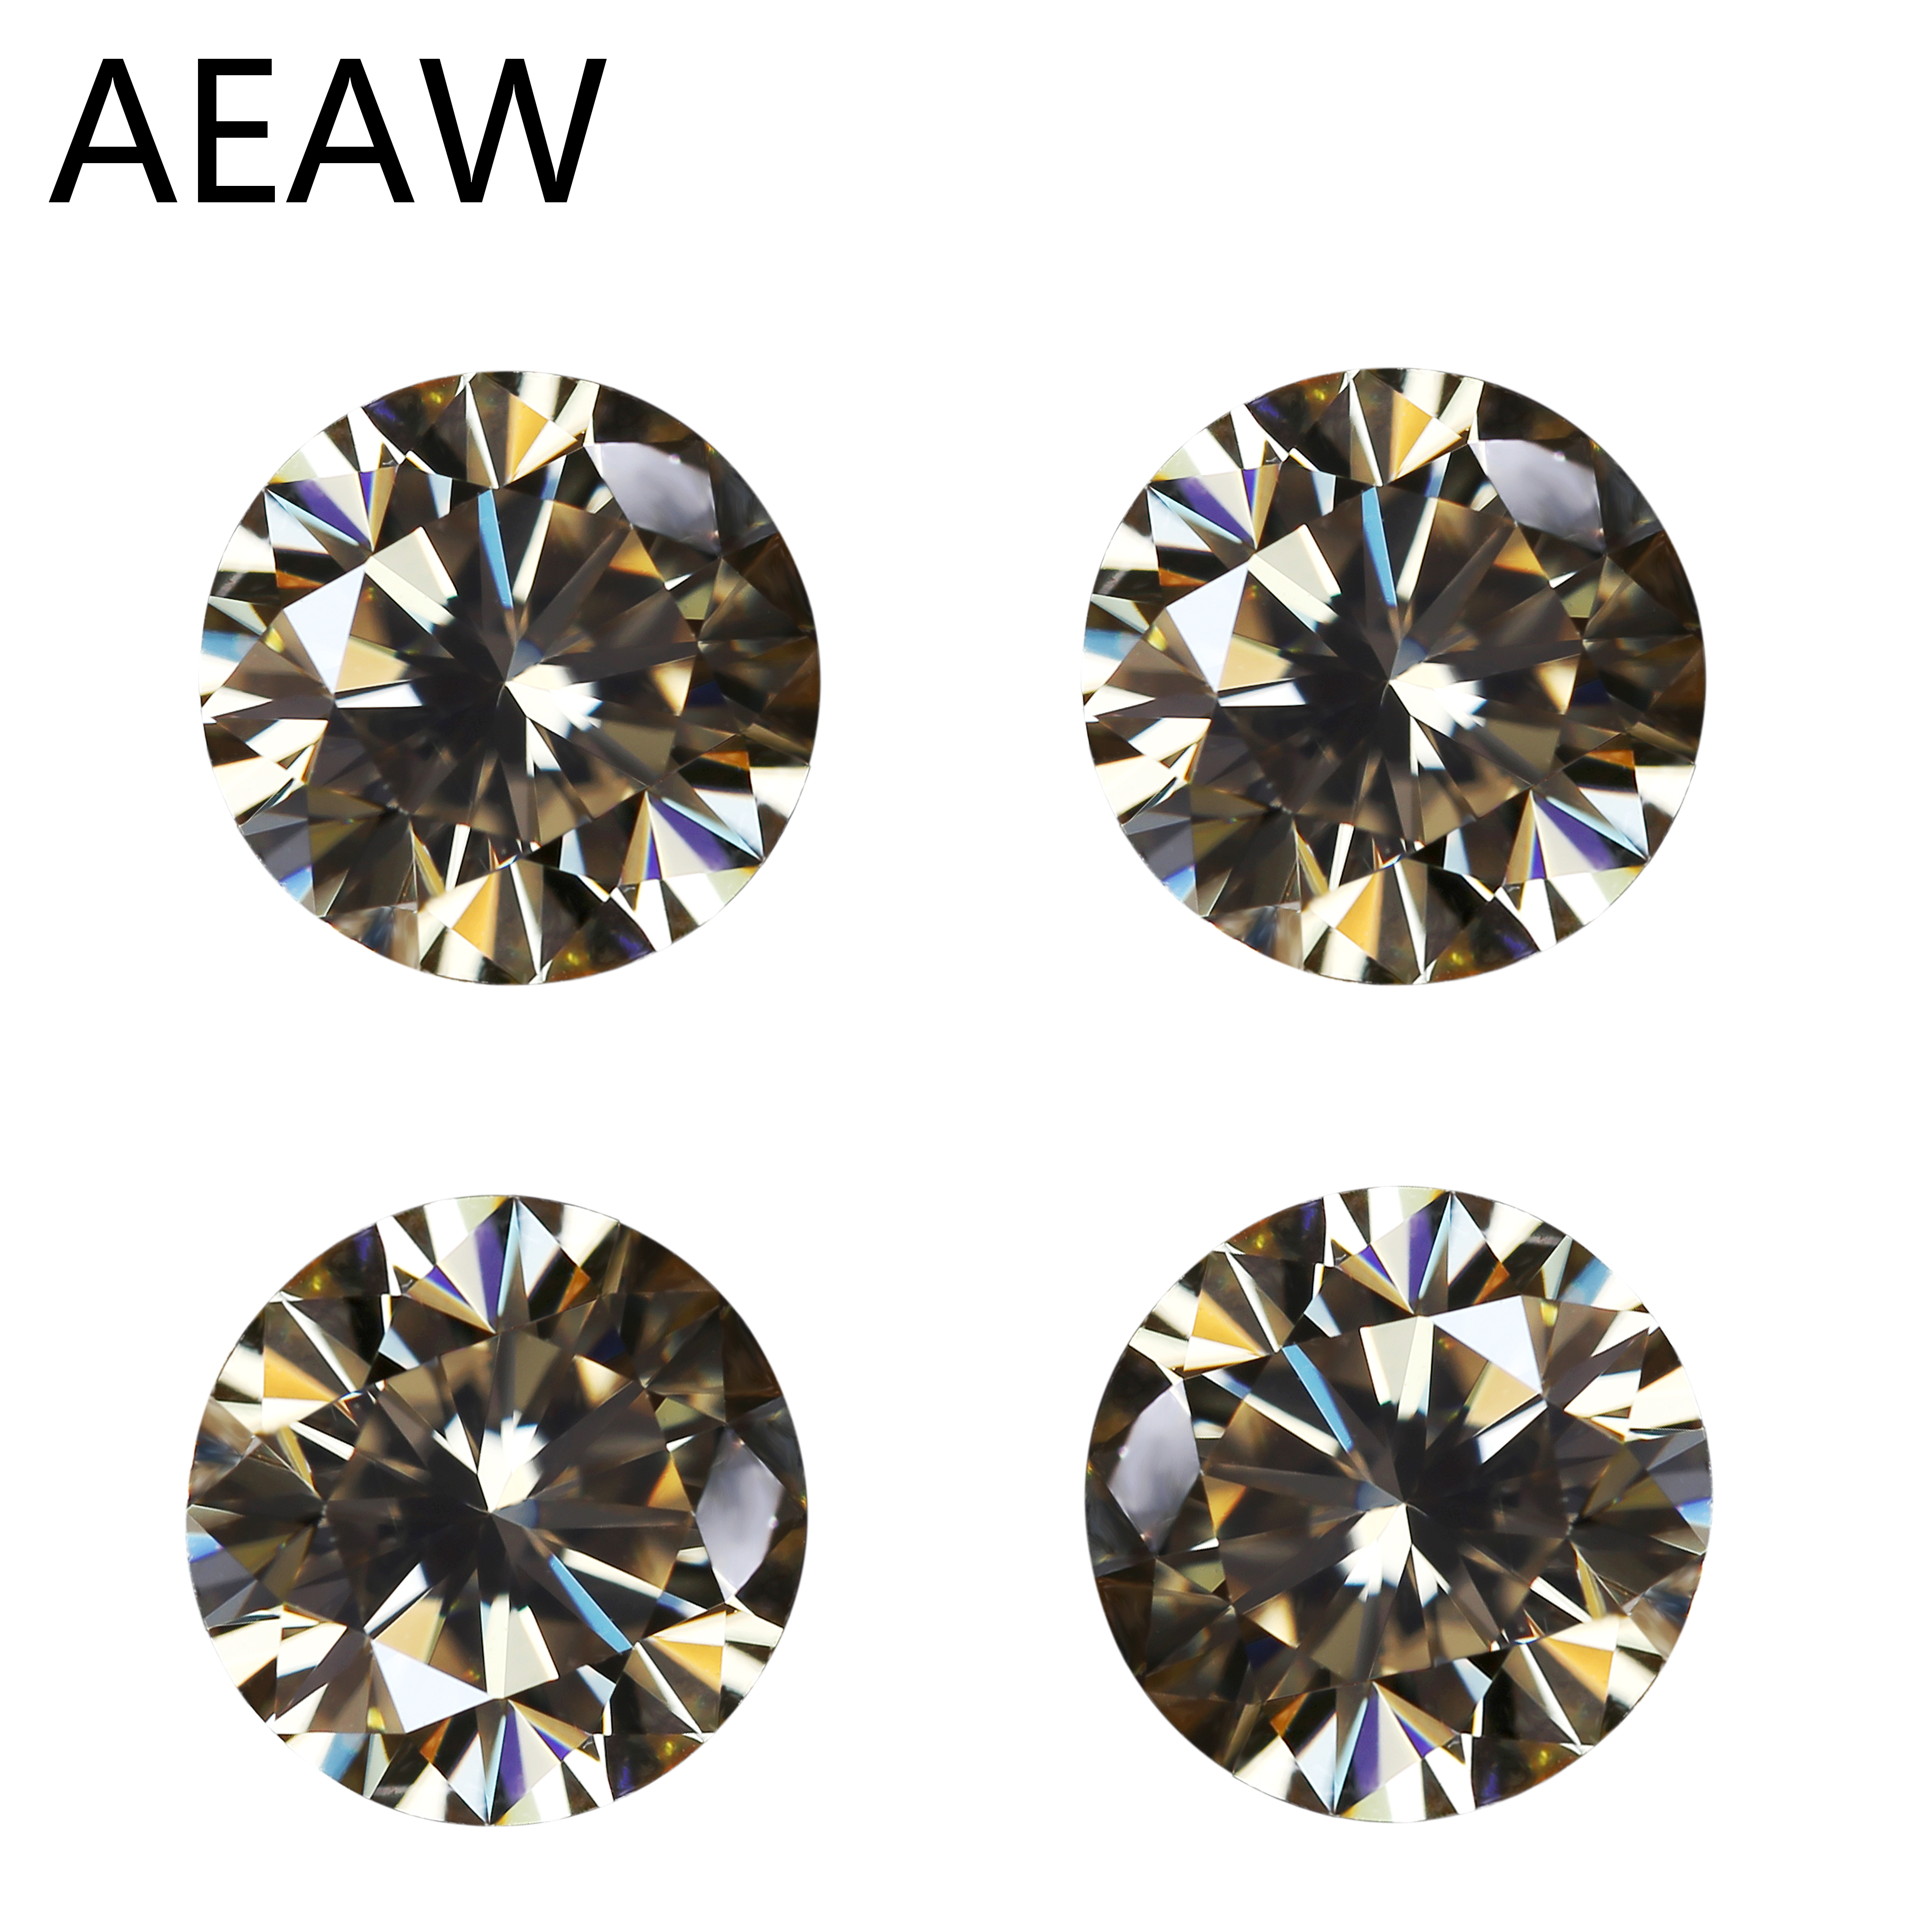 VVS1 Excellent Cut Grade Test Positive 4mm 0.24ct Carat Round Cut Yellow Moissanite EF Color Loose Stones Moissanite